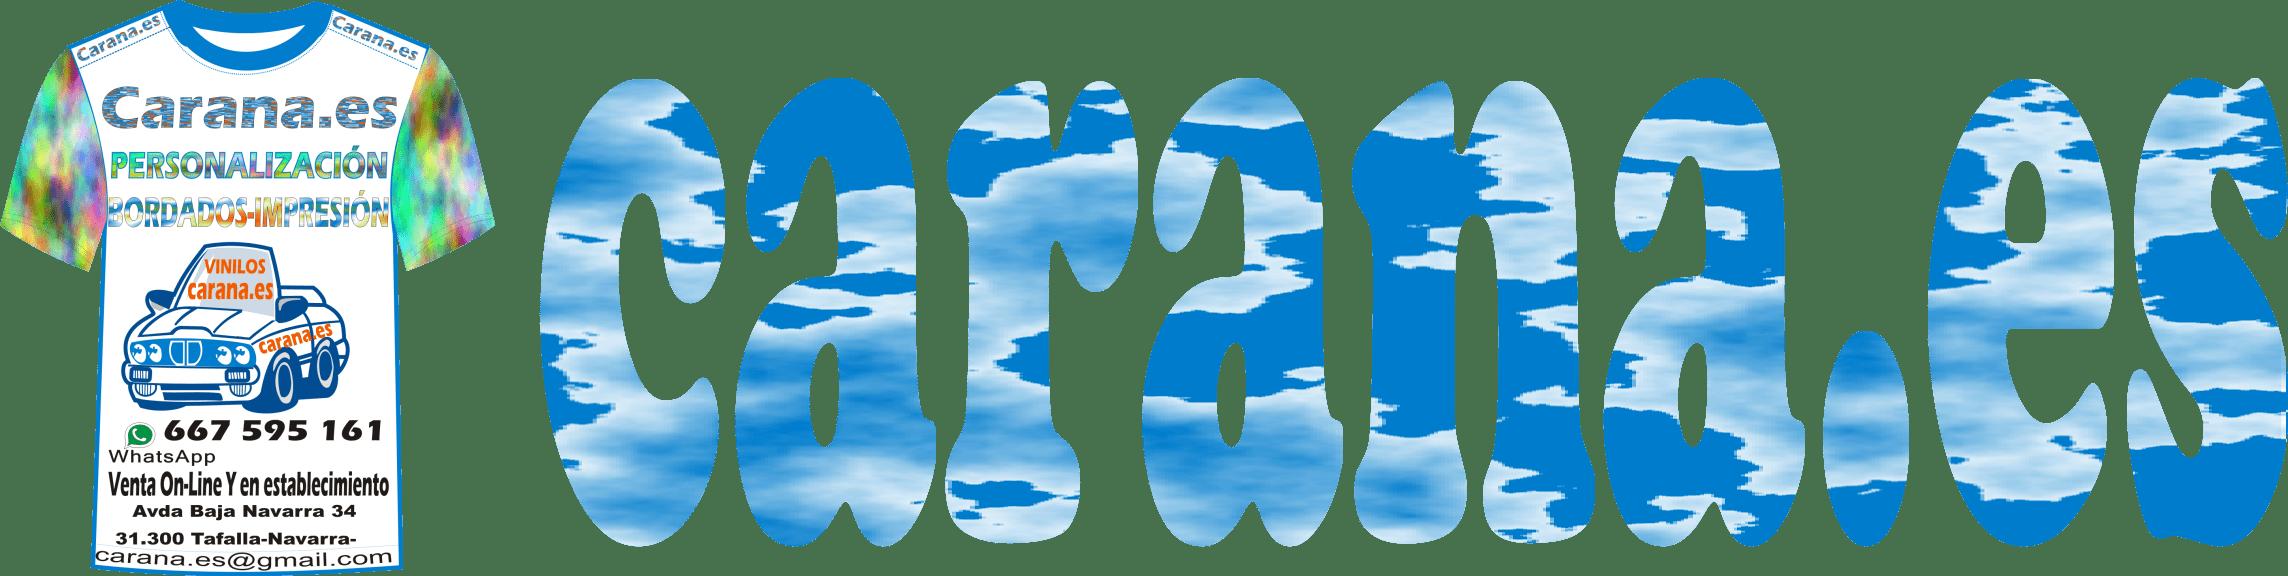 camiseta personalizada bordada impresa logo imagen texto